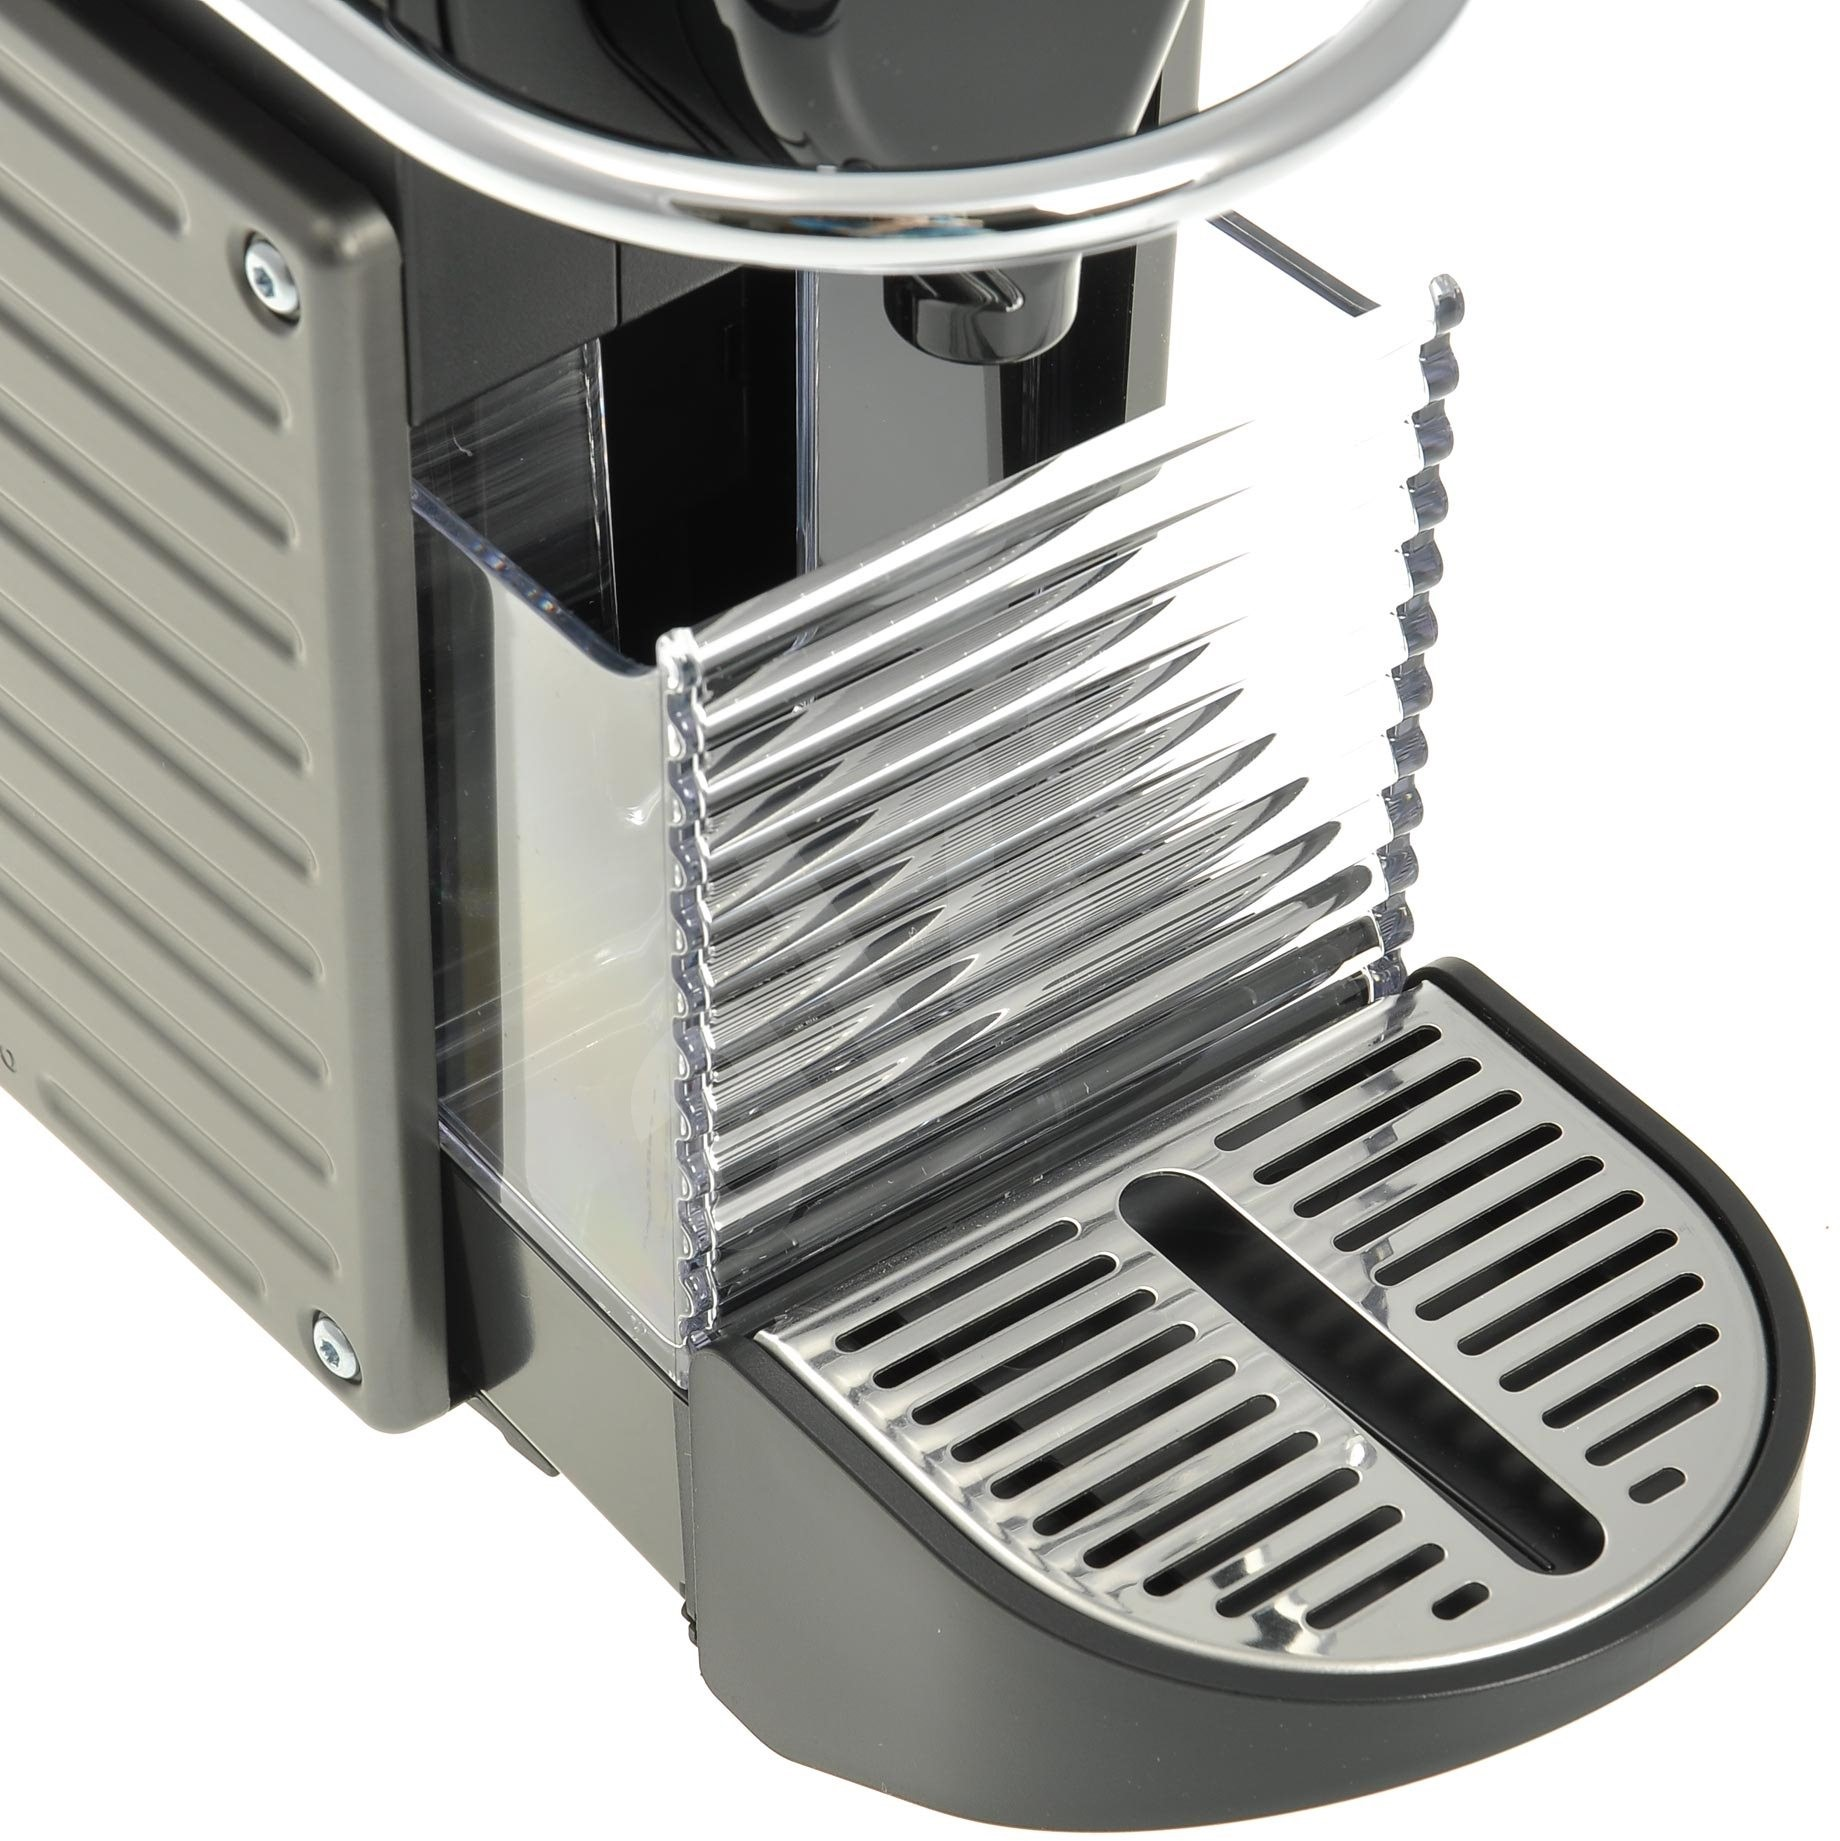 krups nespresso pixie xn300510 kapsel kaffeemaschine. Black Bedroom Furniture Sets. Home Design Ideas